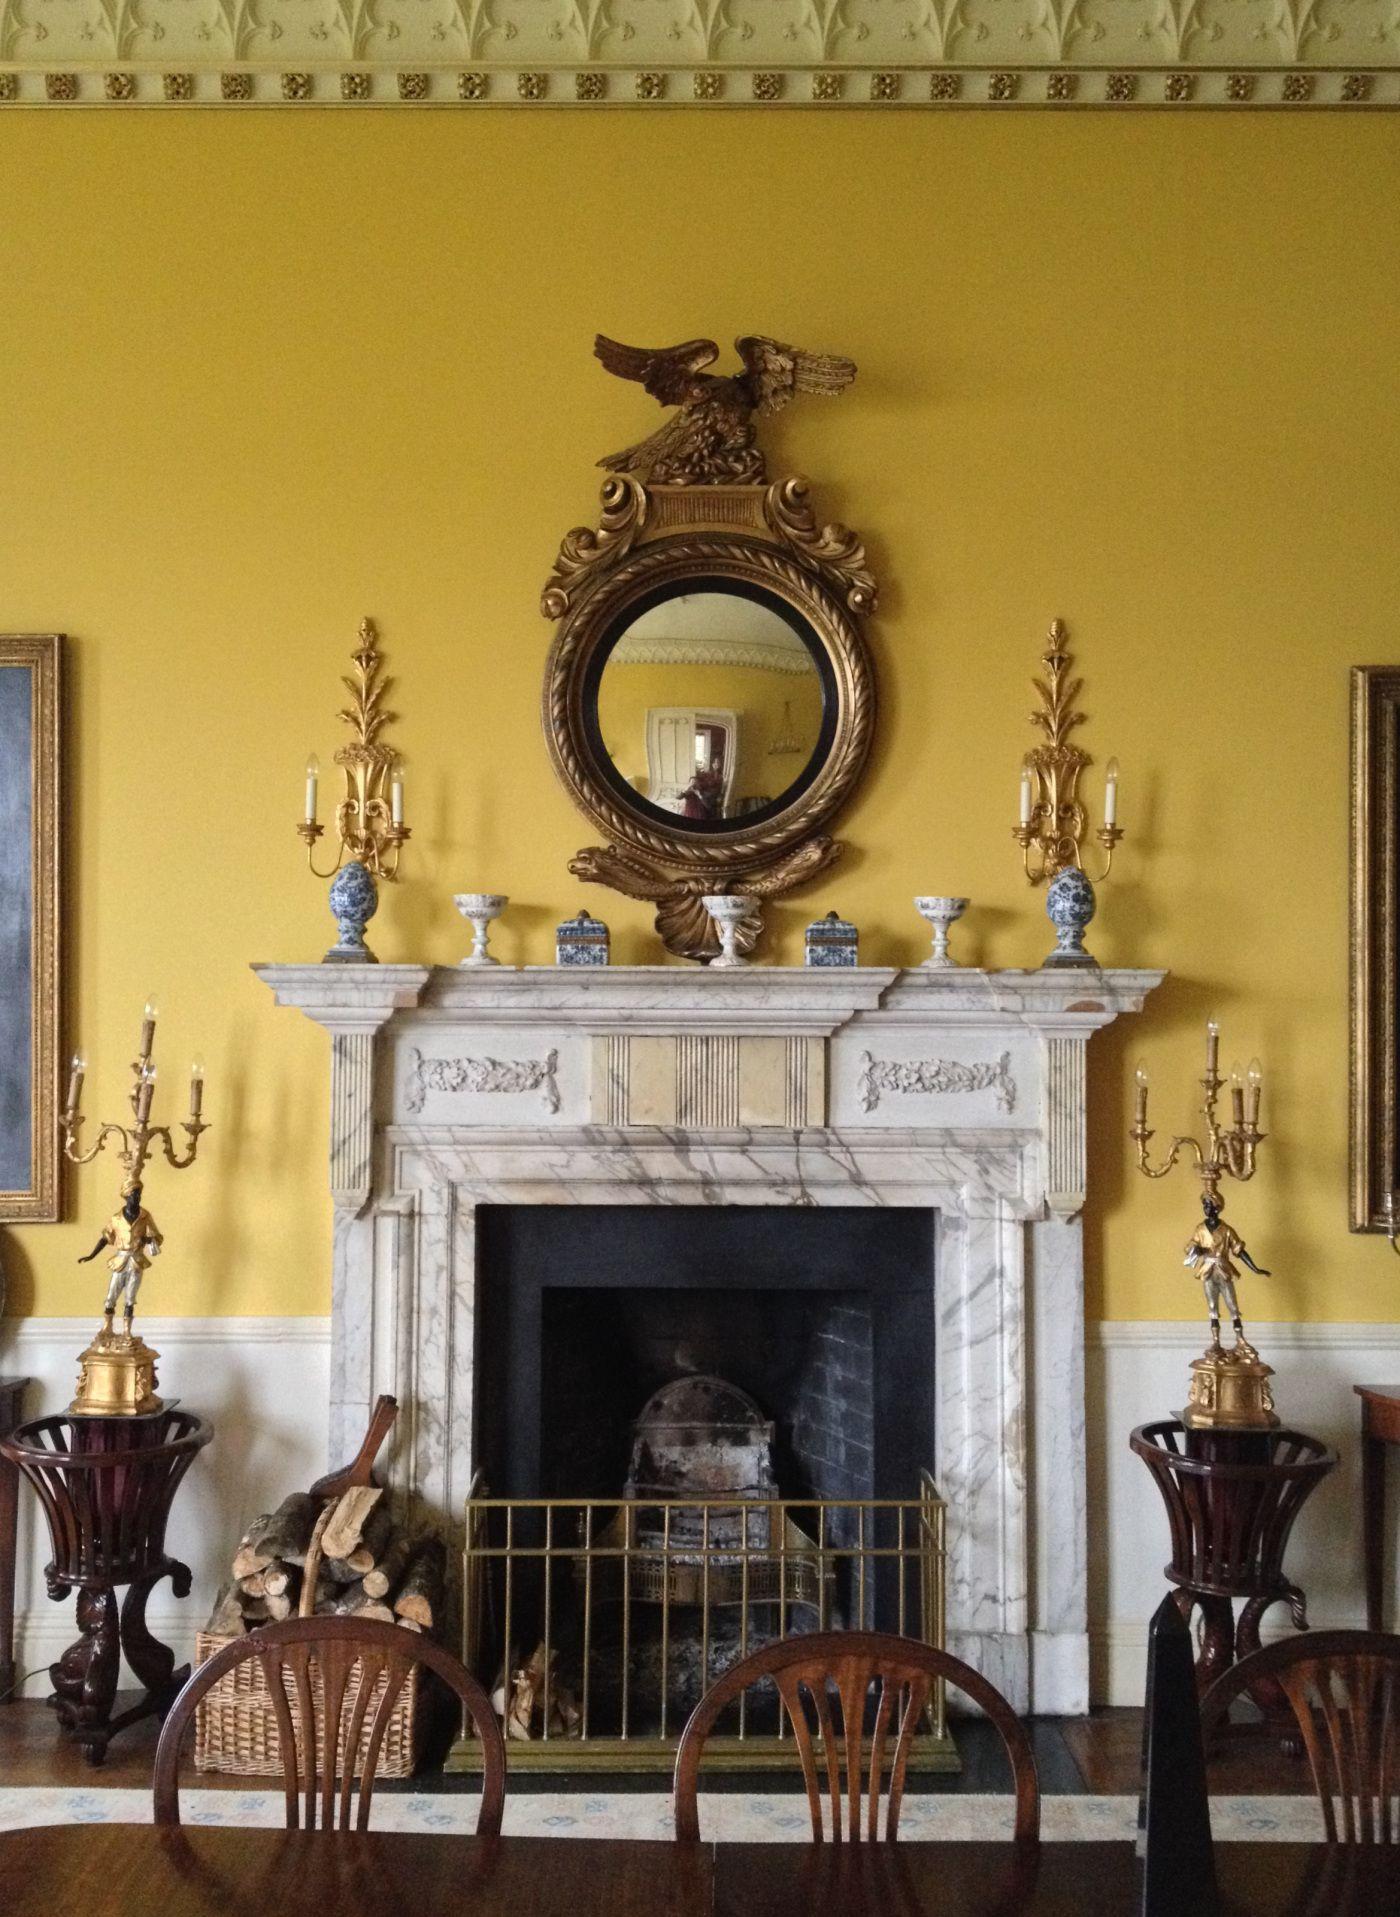 Domat Omnia Virtus Georgian Interiors Fireplace Mantel Designs Regency Dining Room